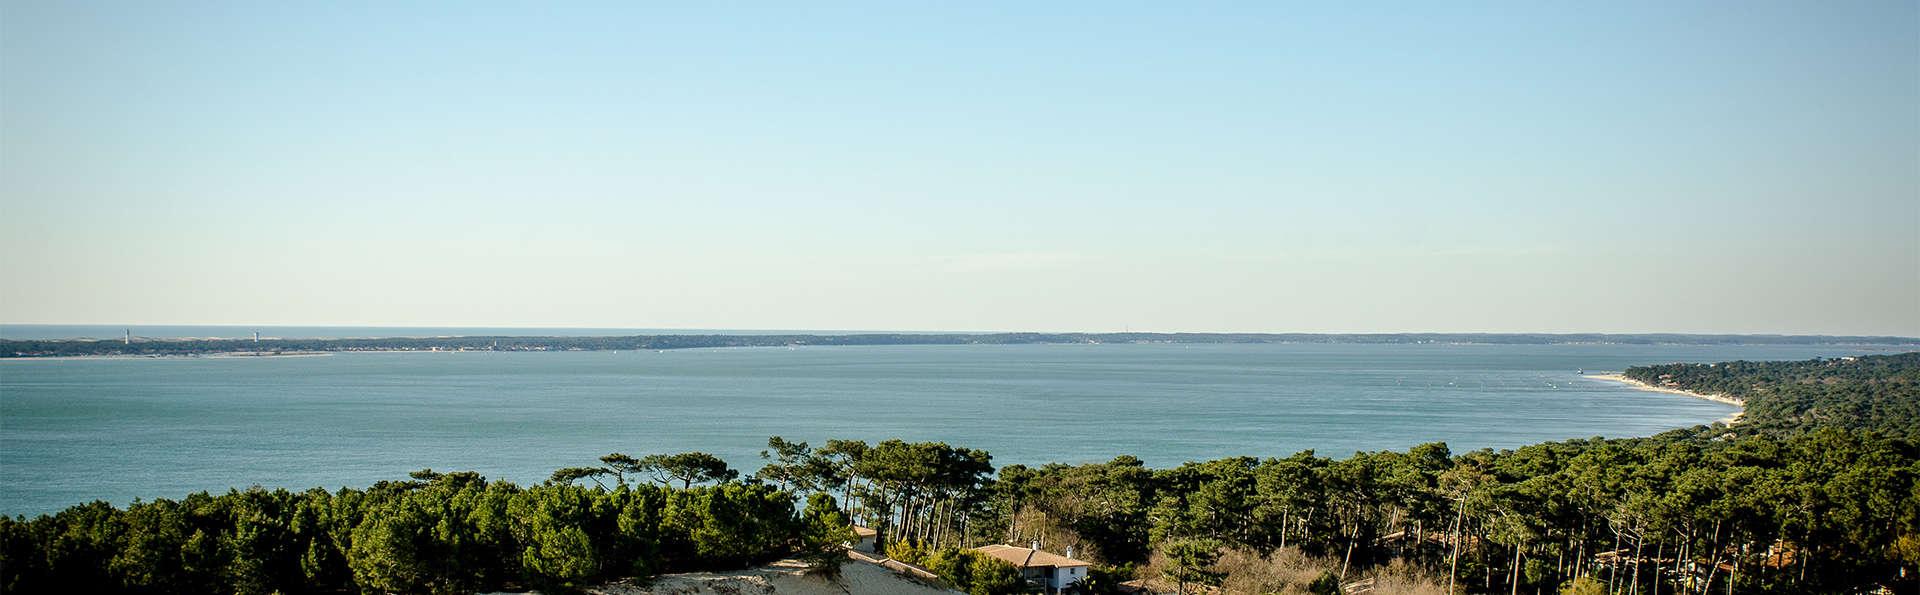 Best Western Plus - Design & Spa Bassin d'Arcachon - EDIT_destination4.jpg